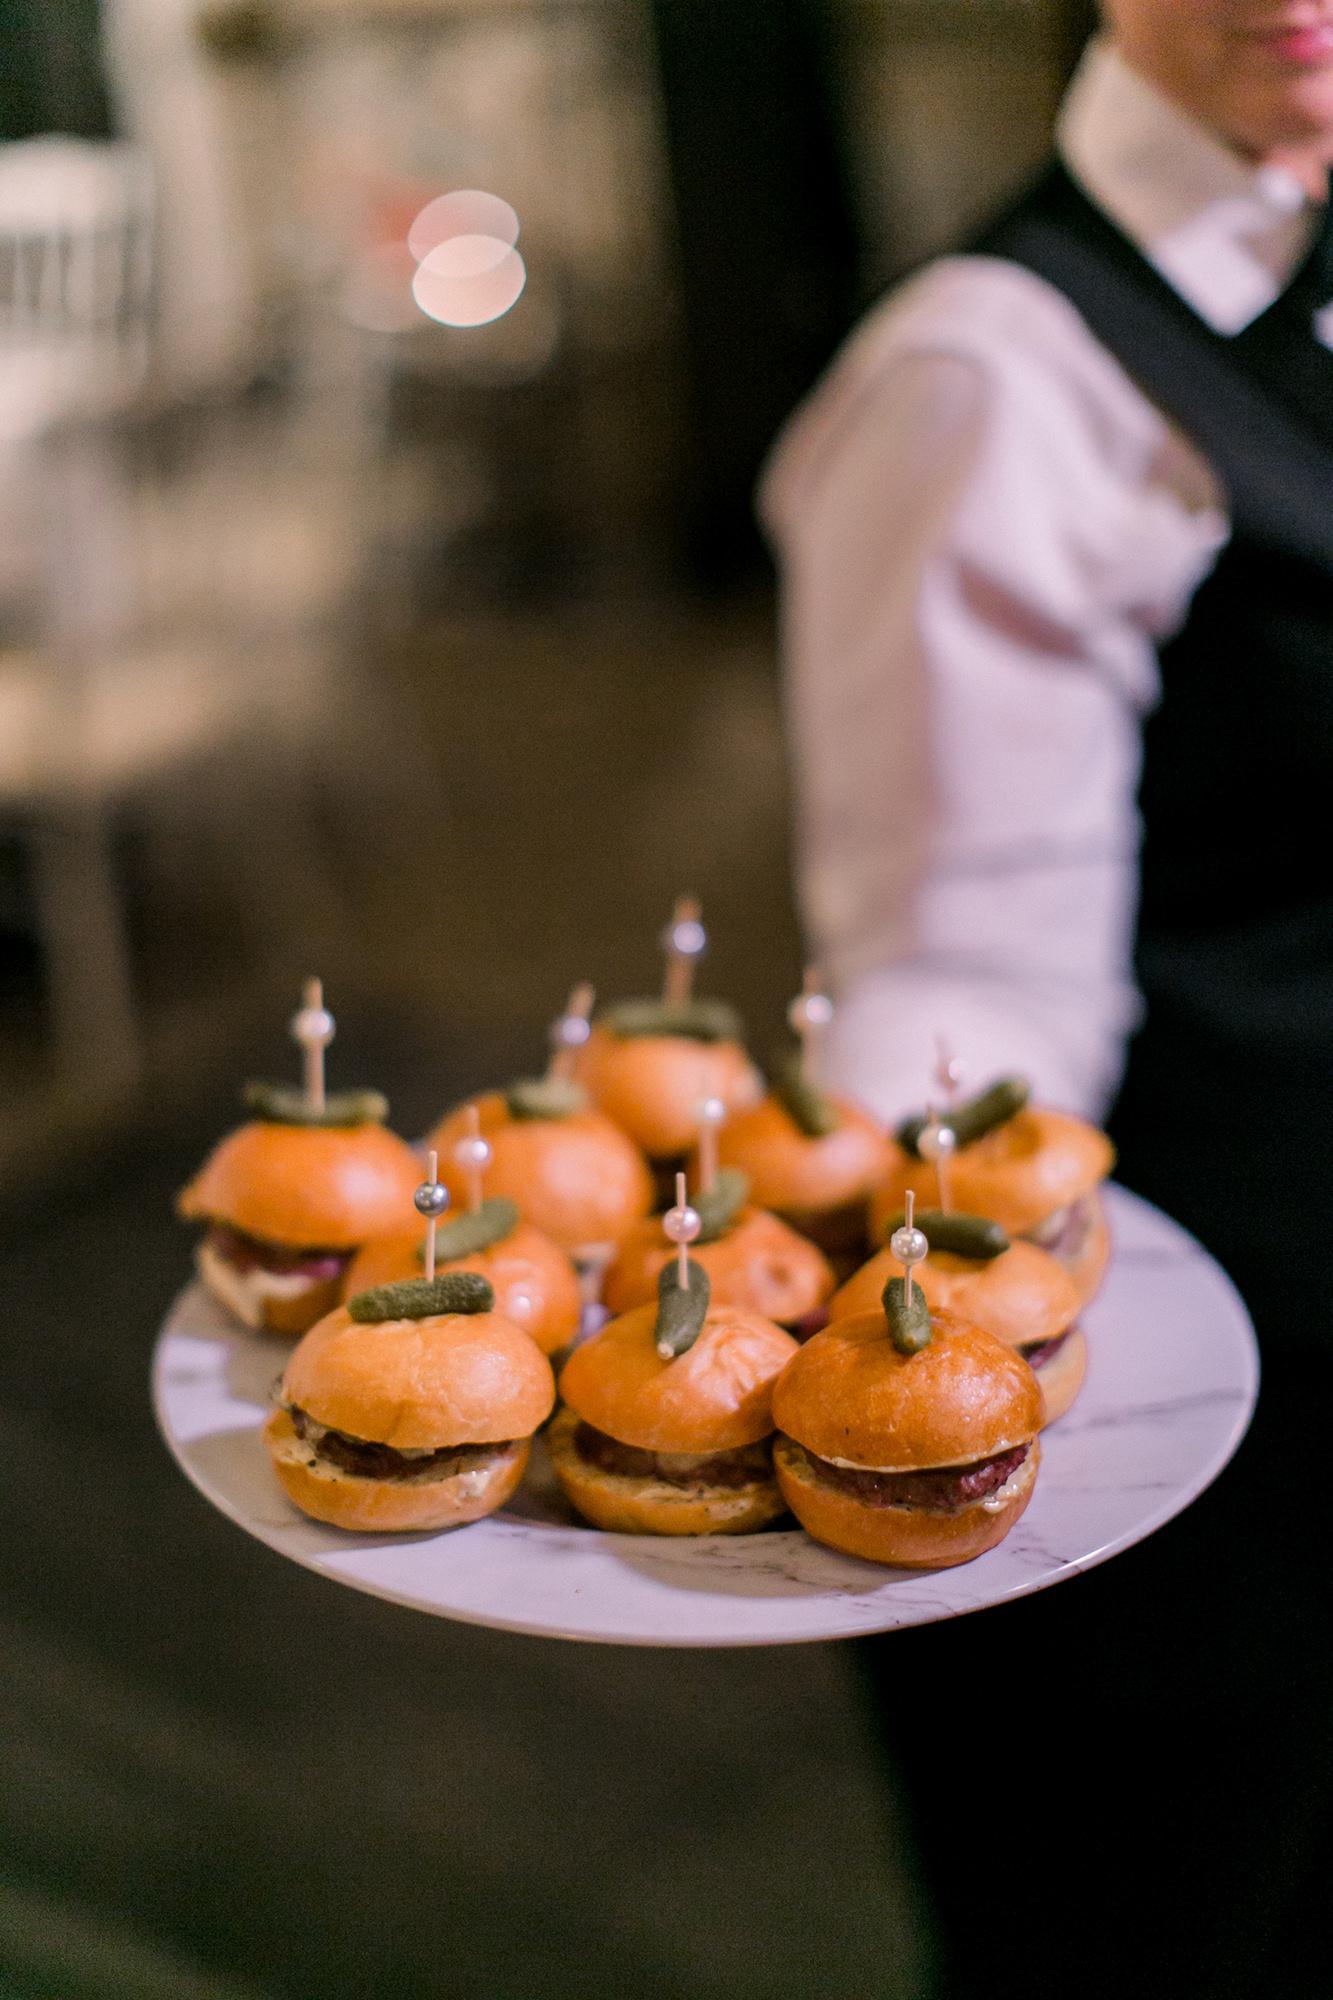 Hamburger Sliders With Gherkin